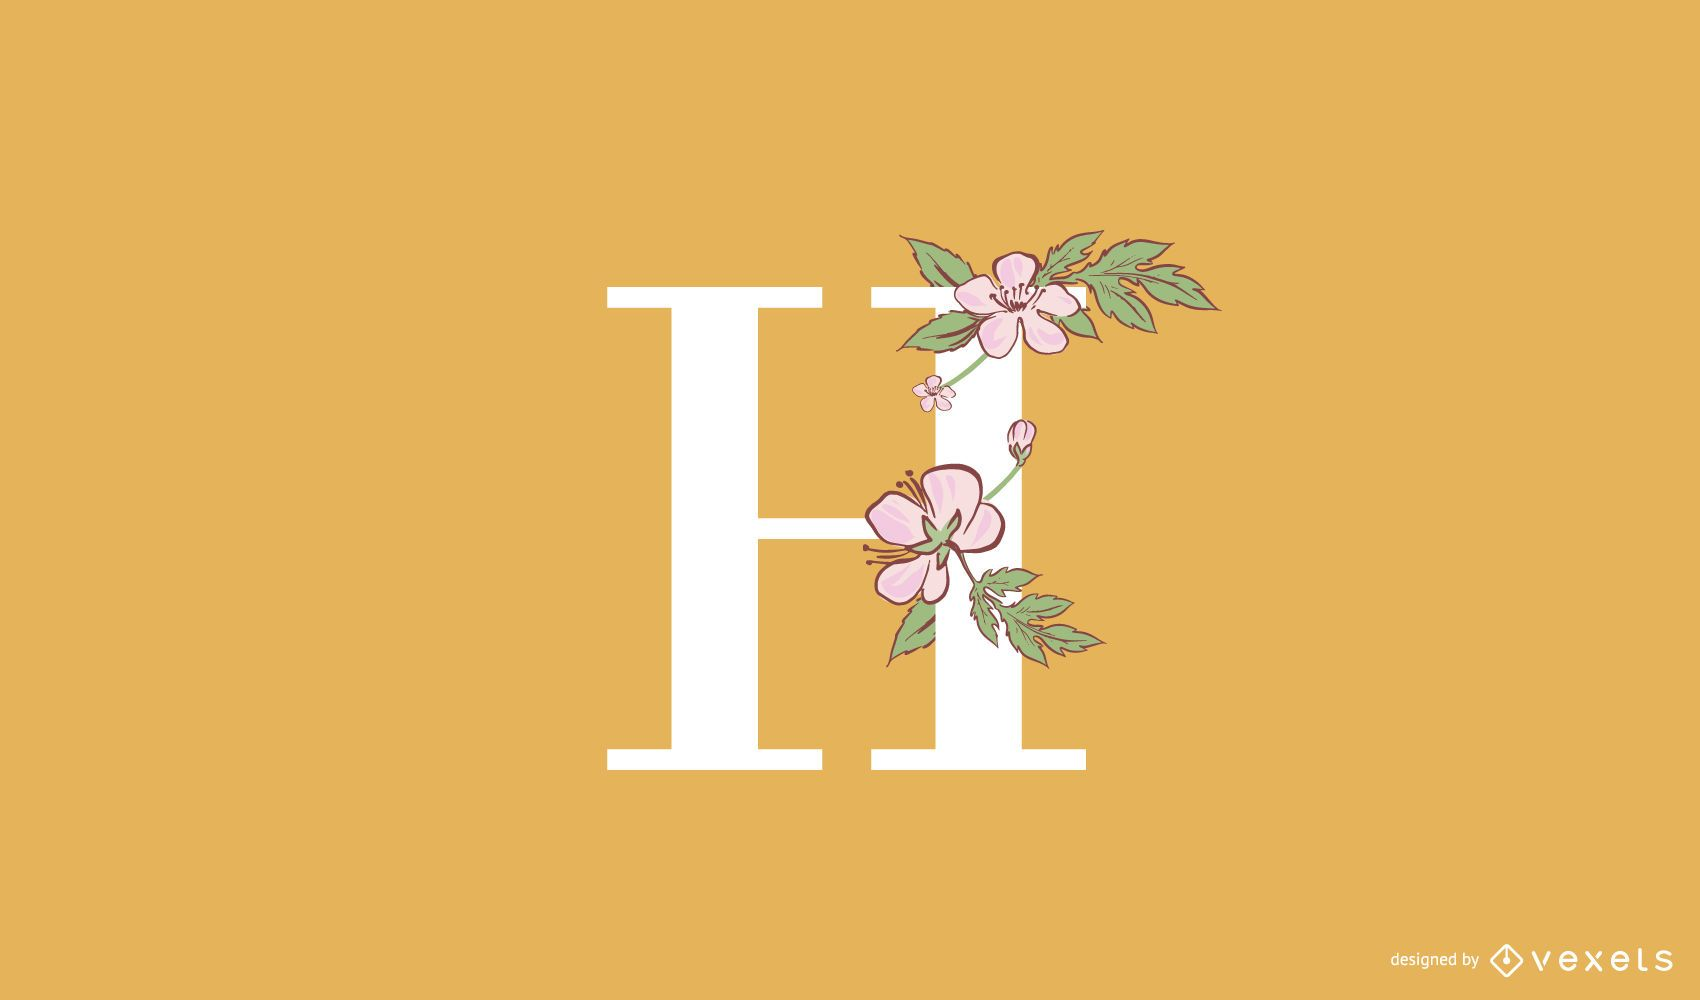 Modelo de logotipo floral com letra H